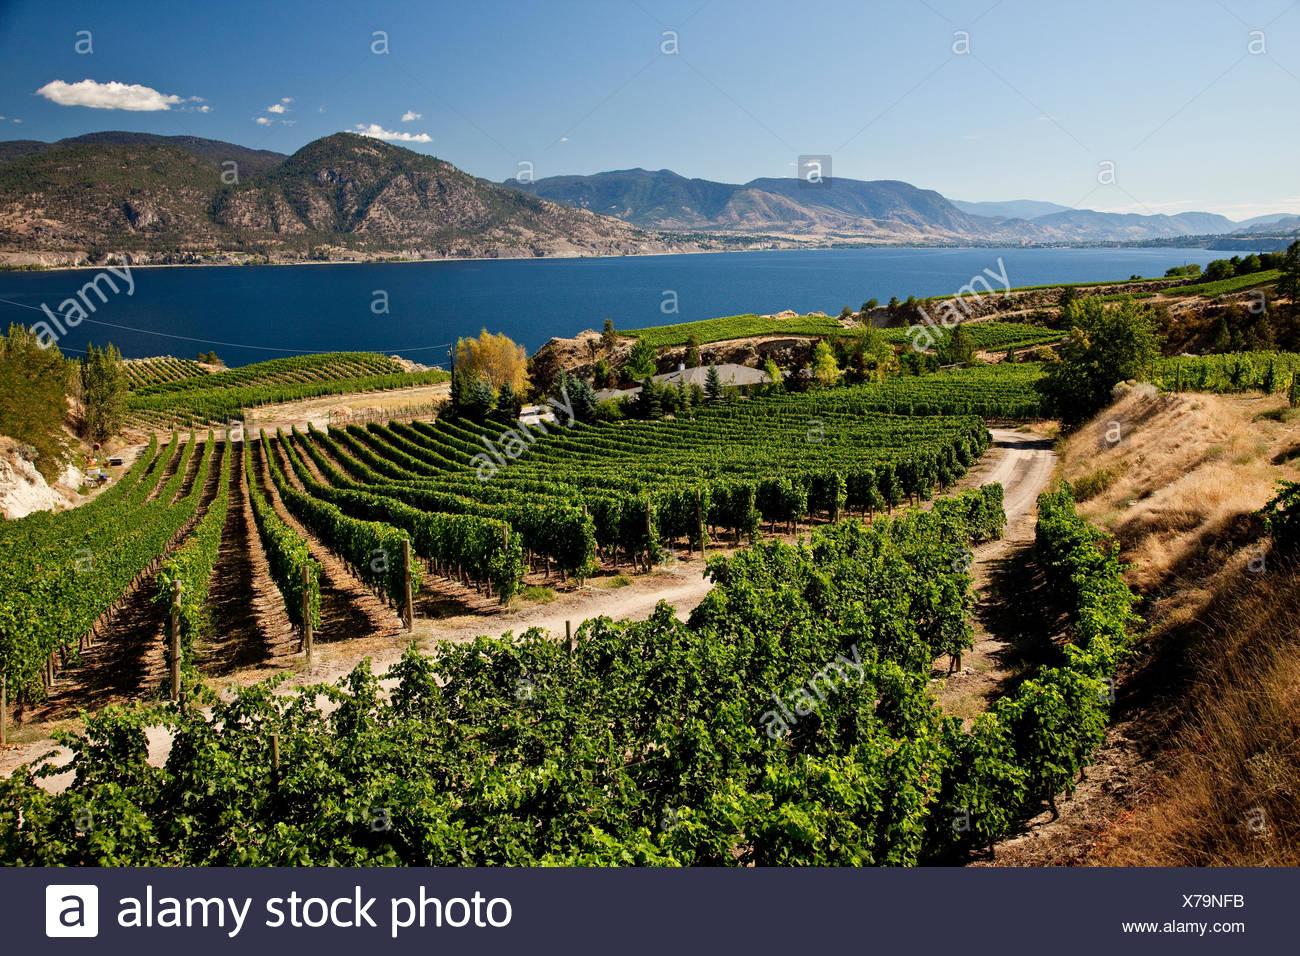 Naramata Bench vineyards near Penticton, Okanagan Valley, BC, Canada. - Stock Image